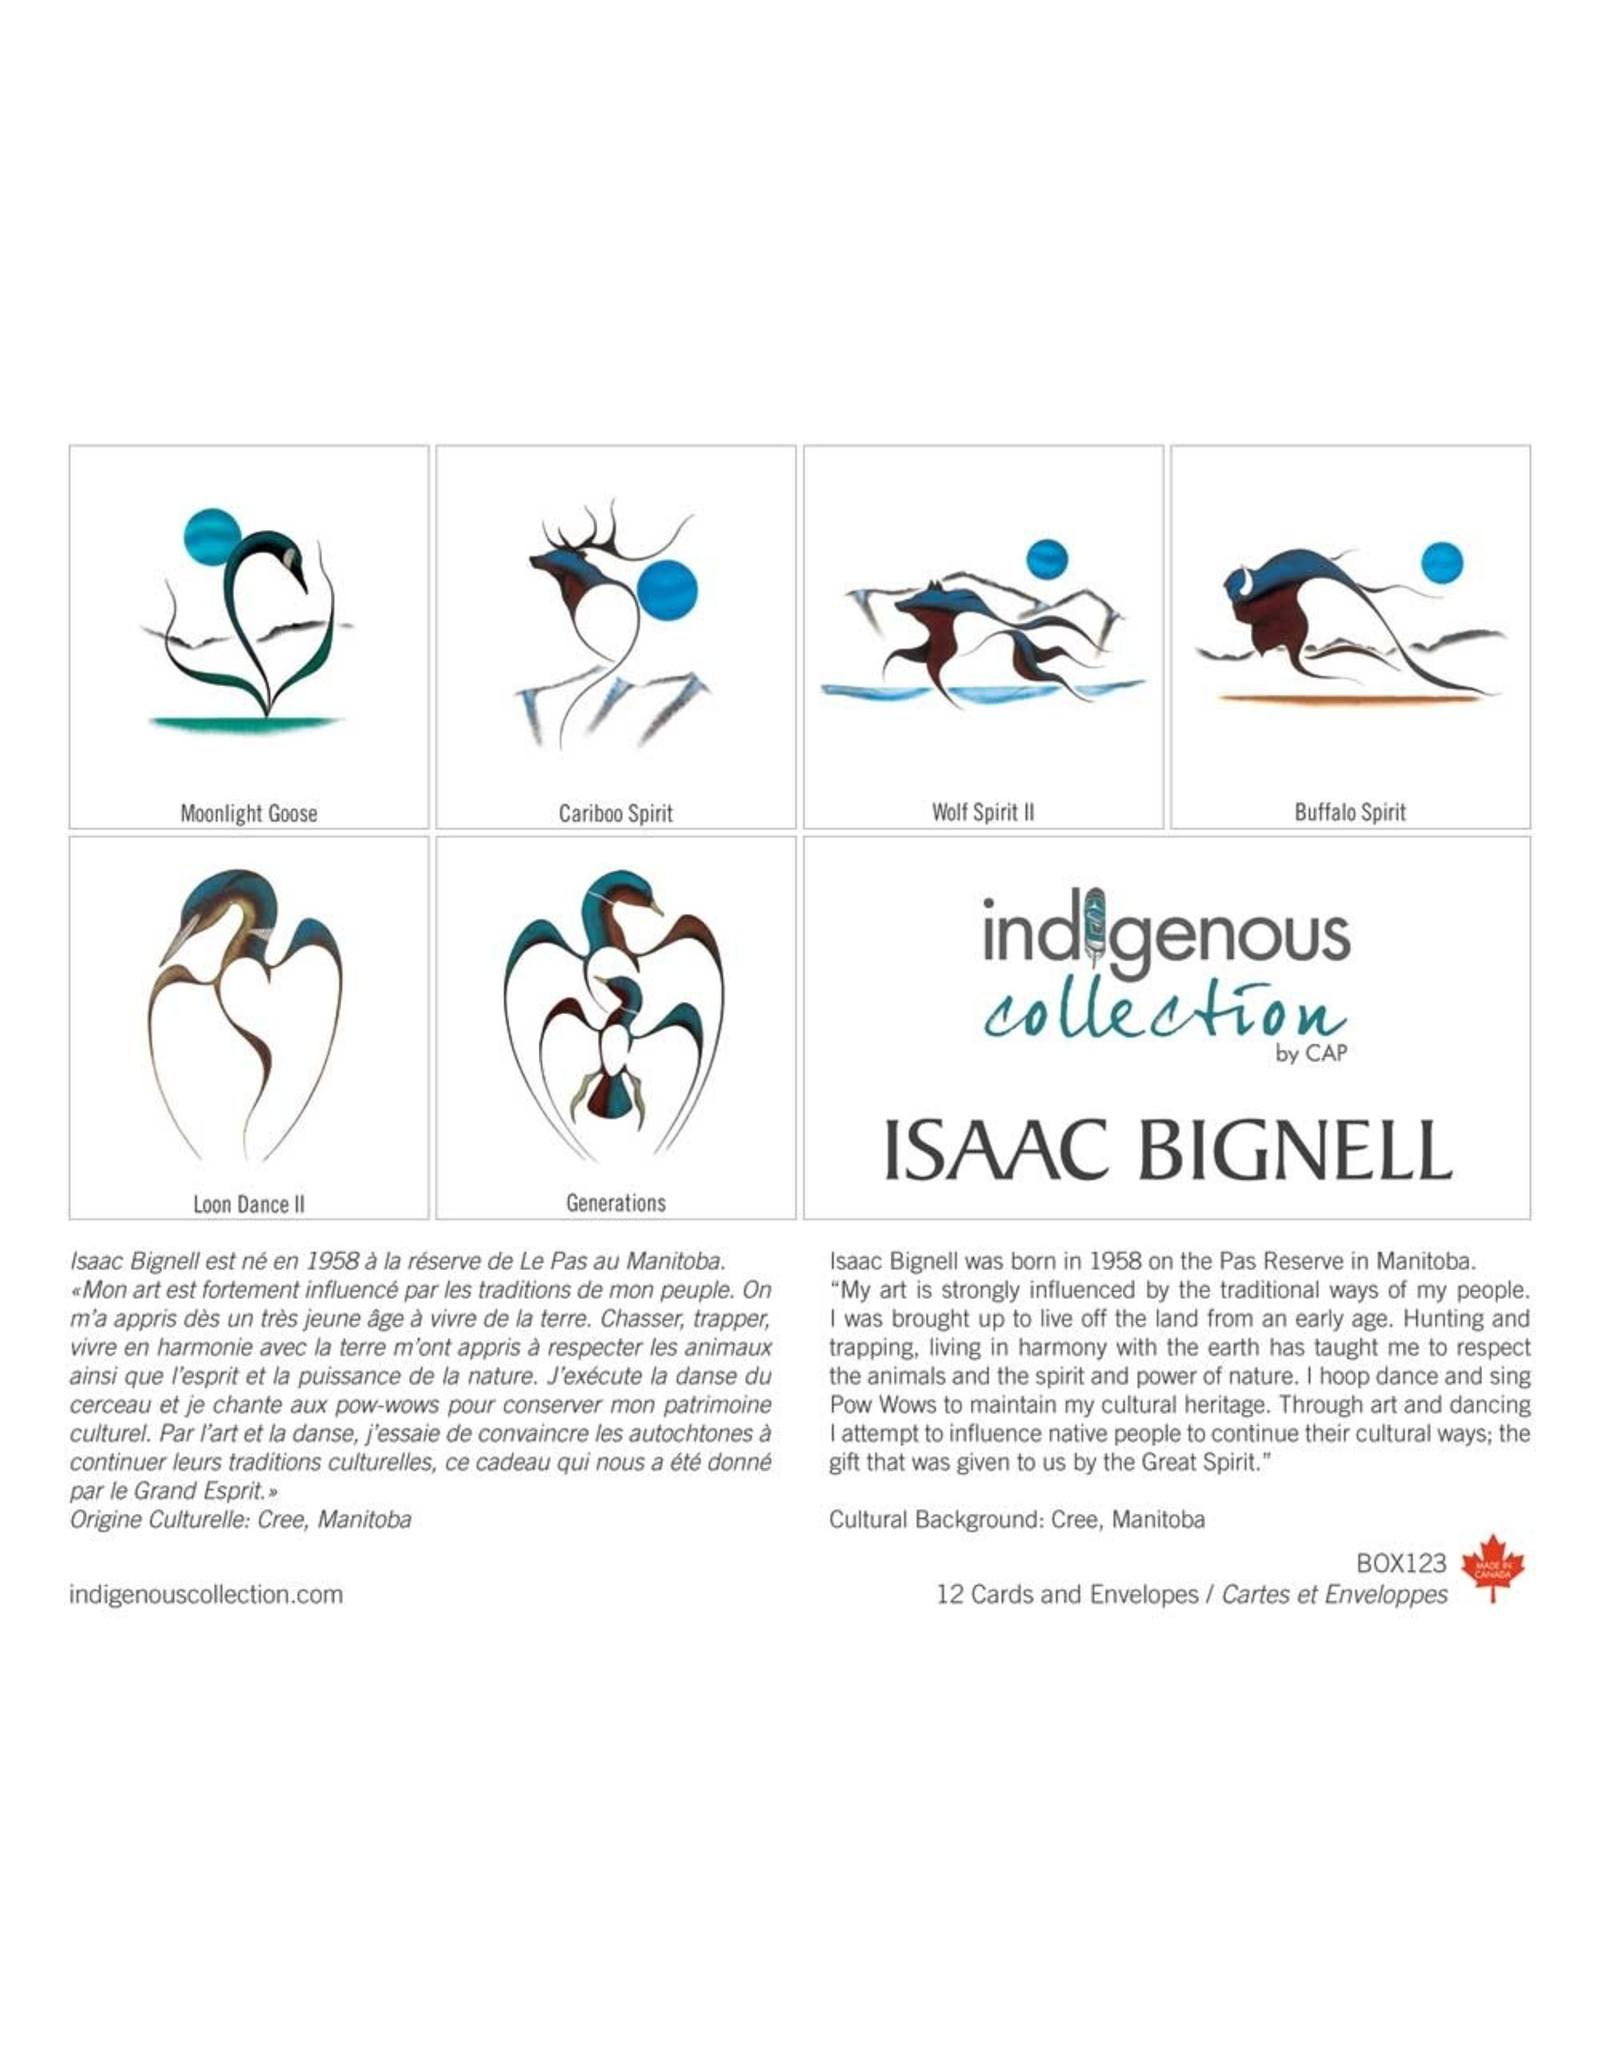 Isaac Bignell 12 Card Box - Box 123